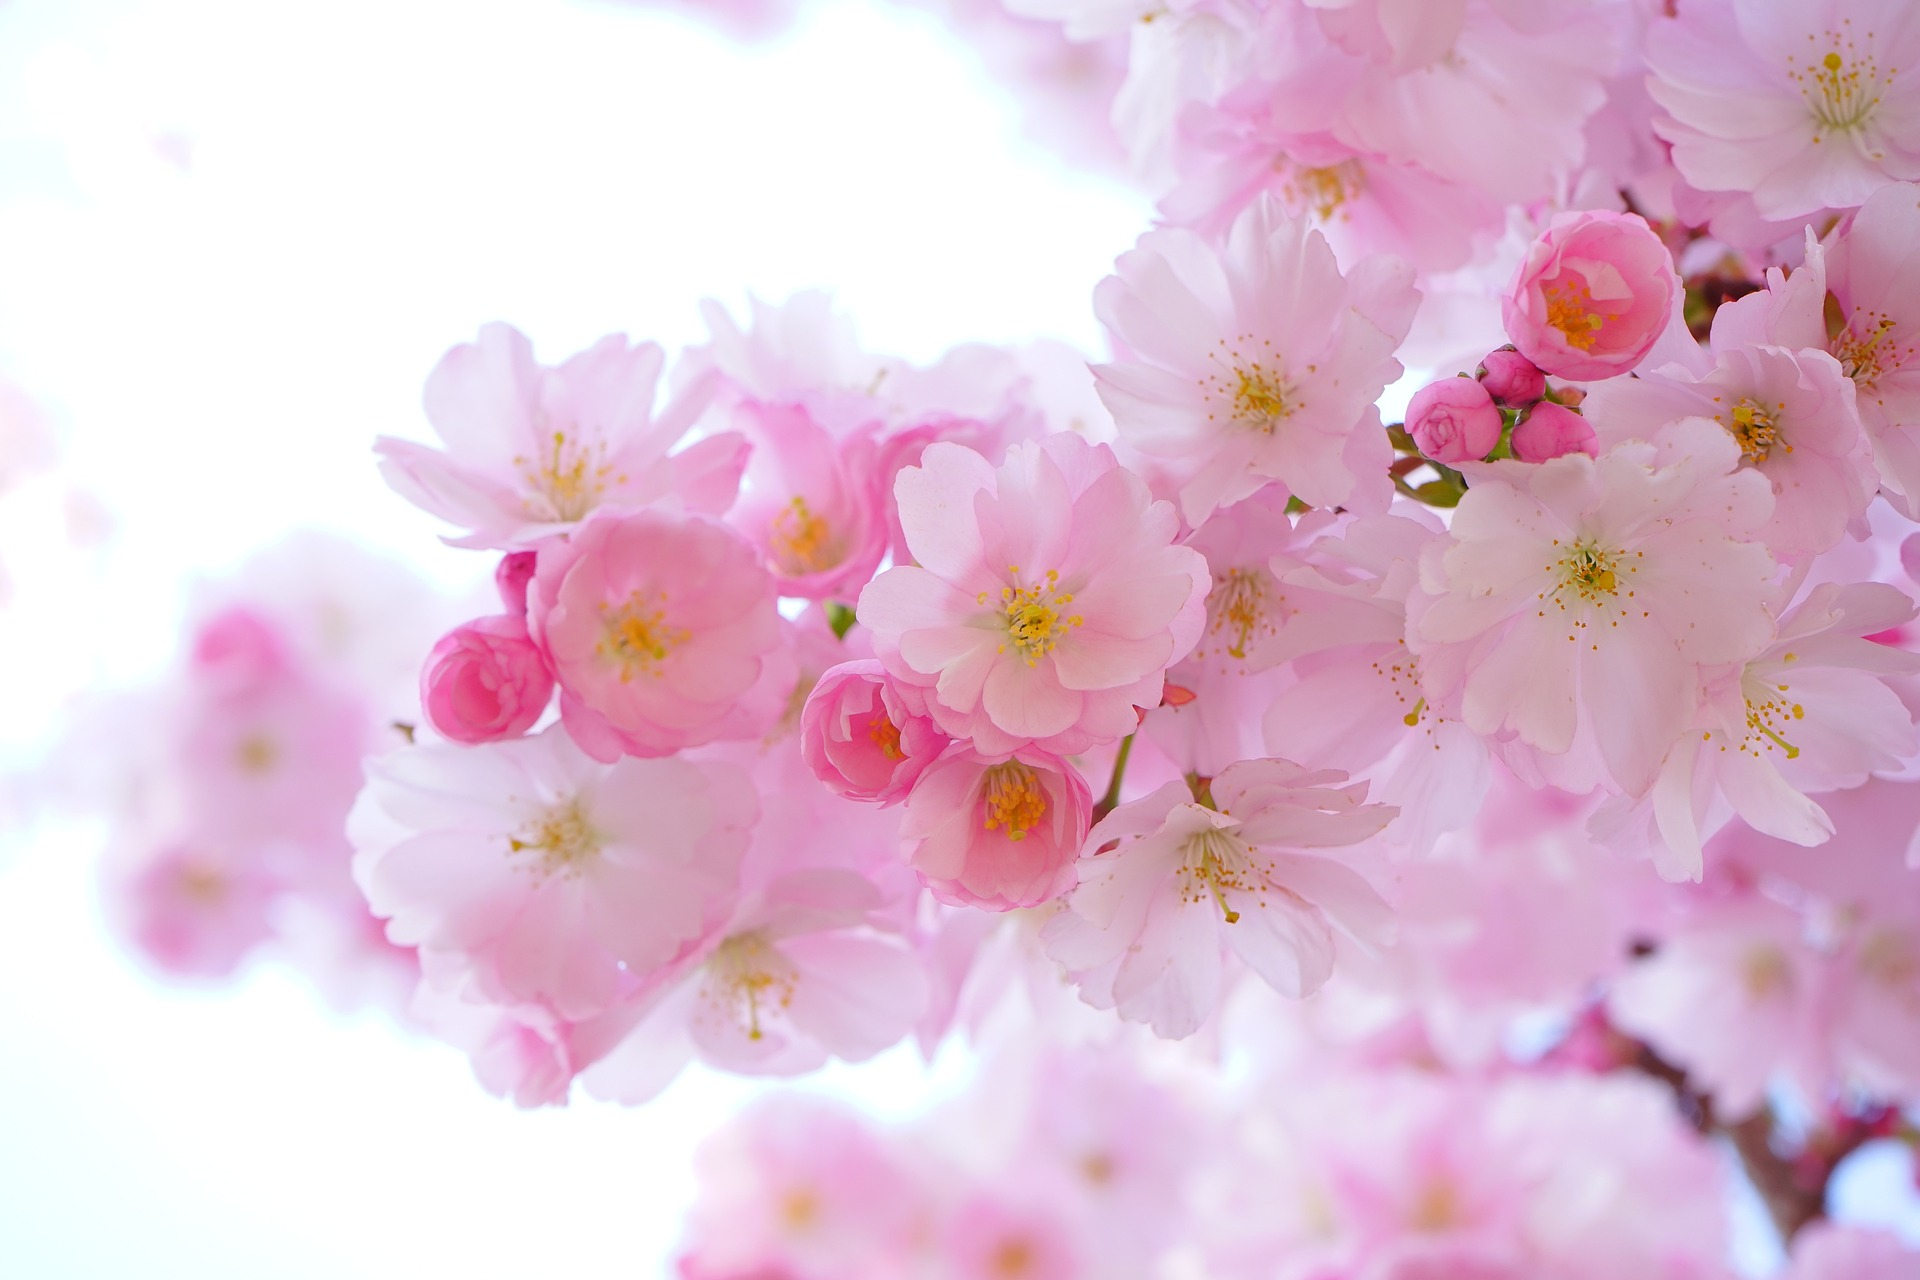 japanese-cherry-trees-324175_1920.jpg